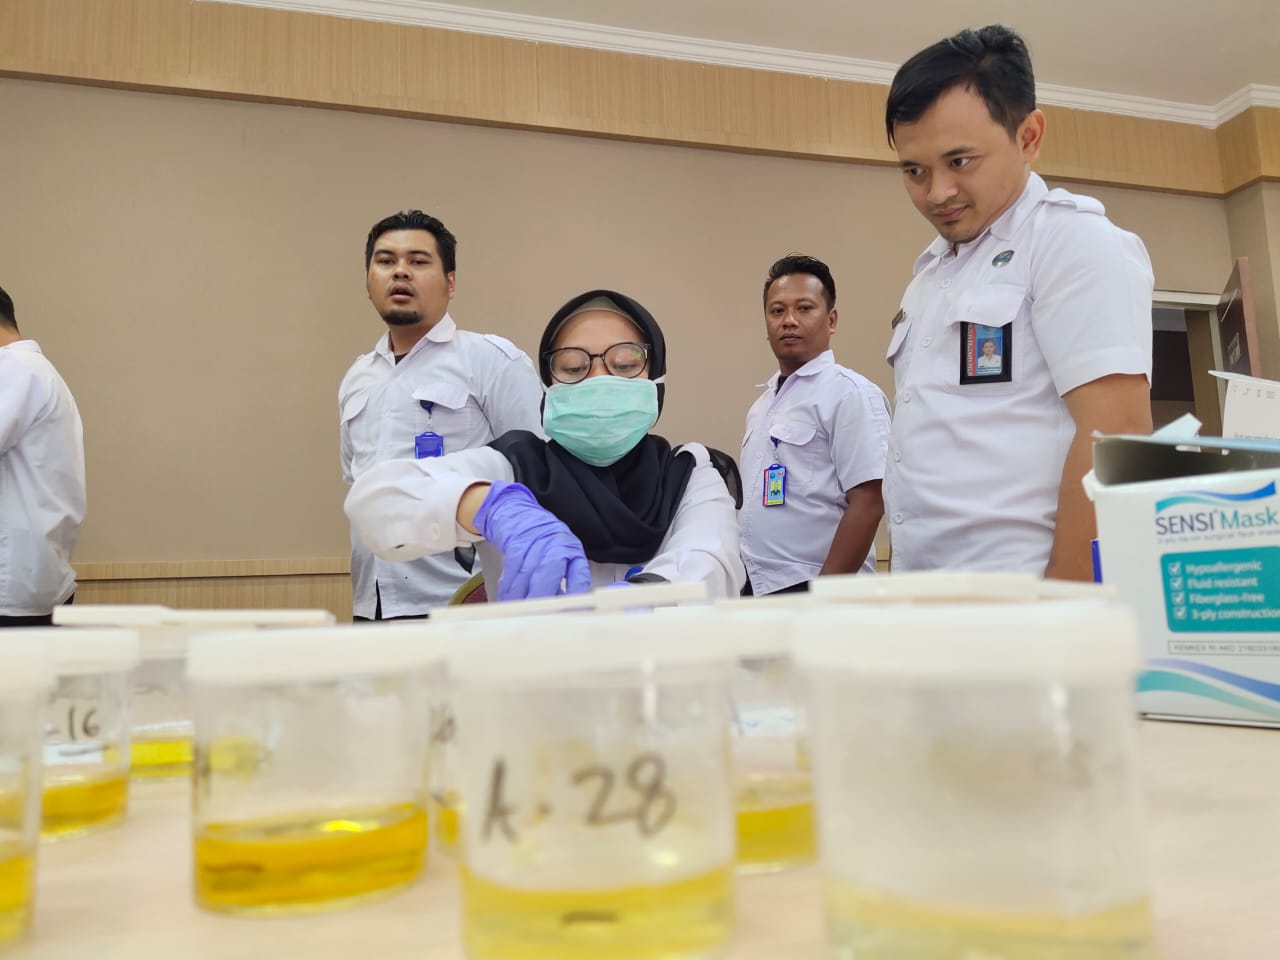 Tingkatkan Pengawasan Internal, Puluhan Anggota BNNP Jatim dites Urine Mendadak